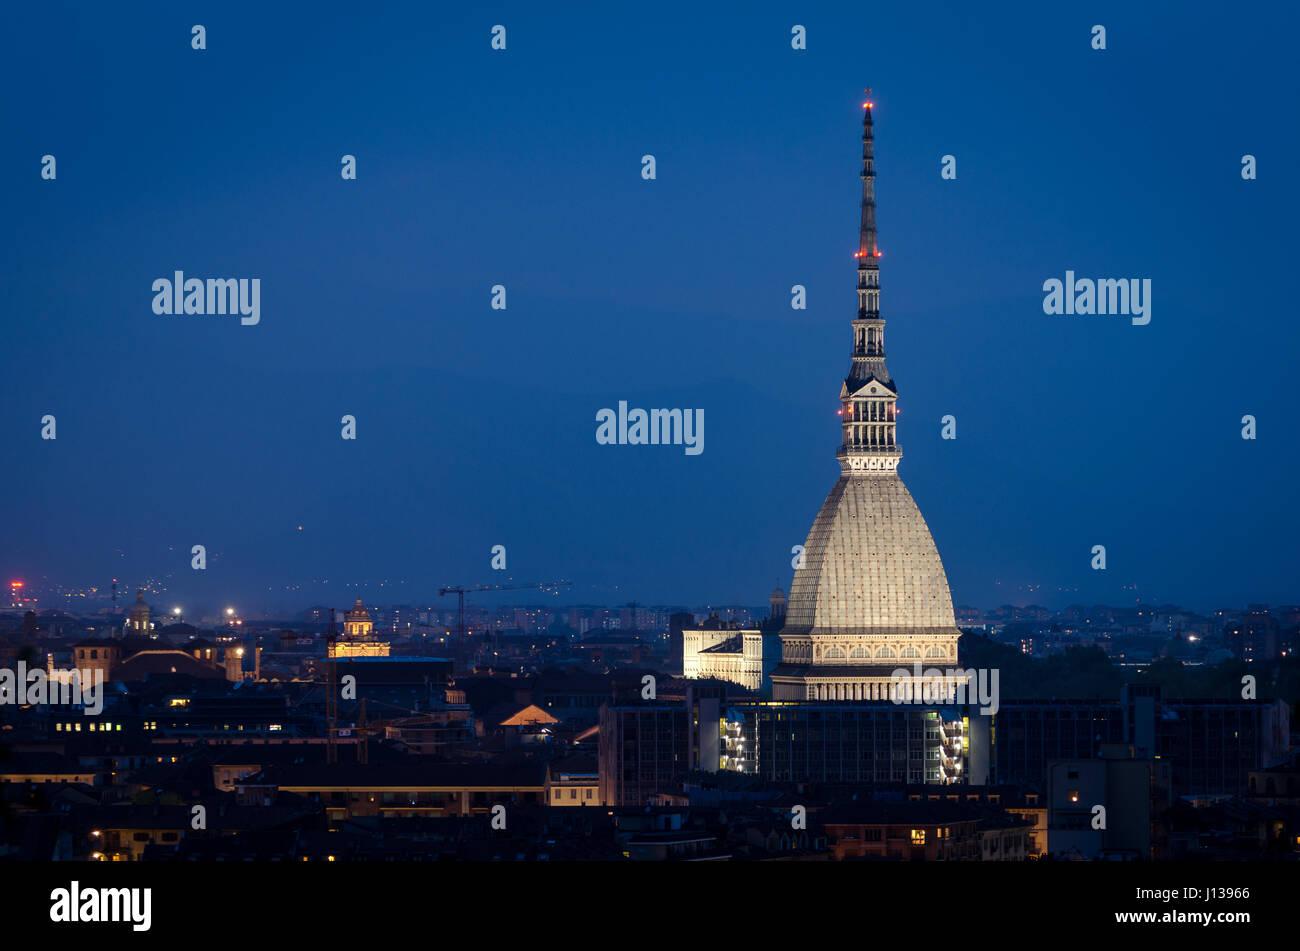 Turin the Mole Antonelliana at night Stock Photo